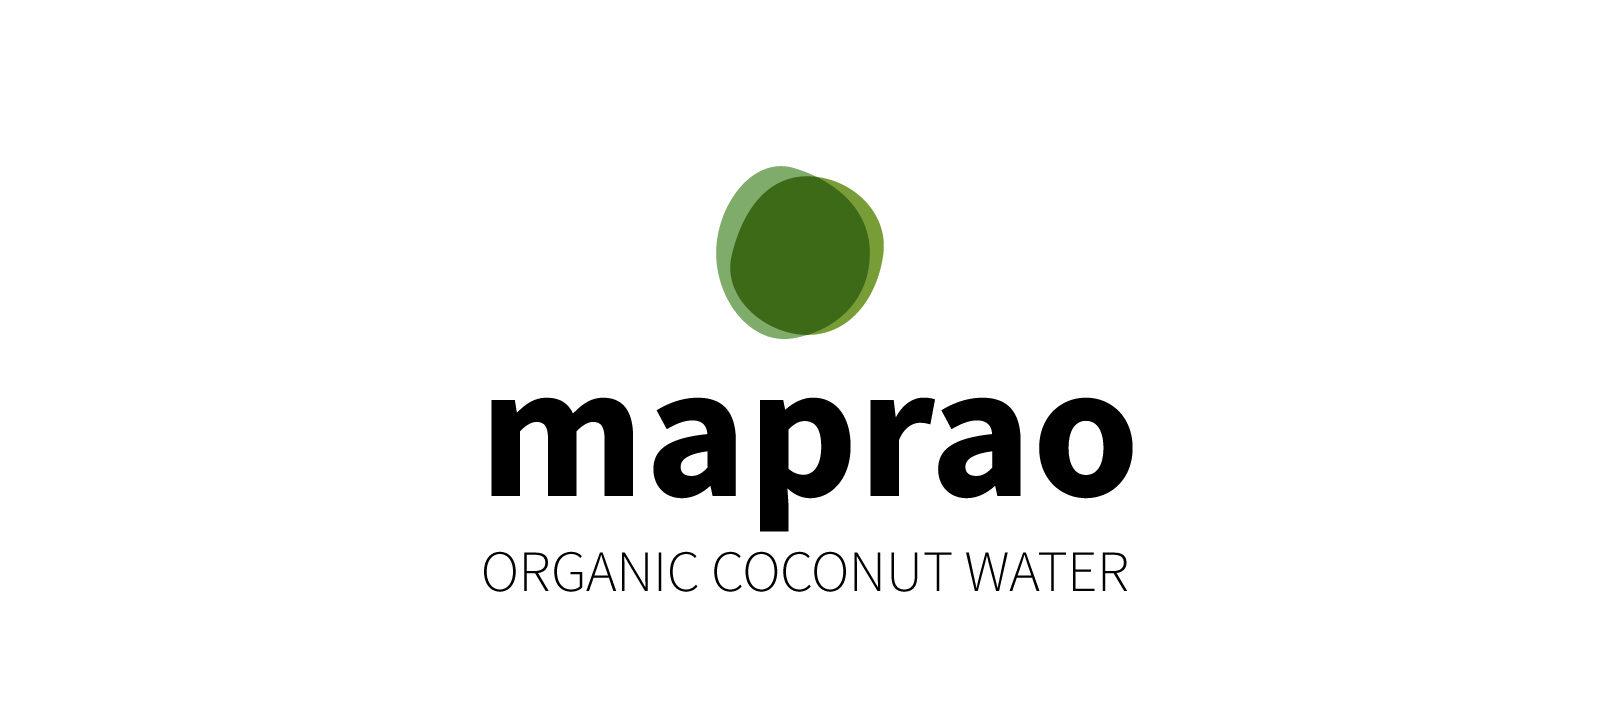 Maprao logo by Suzaku Productions